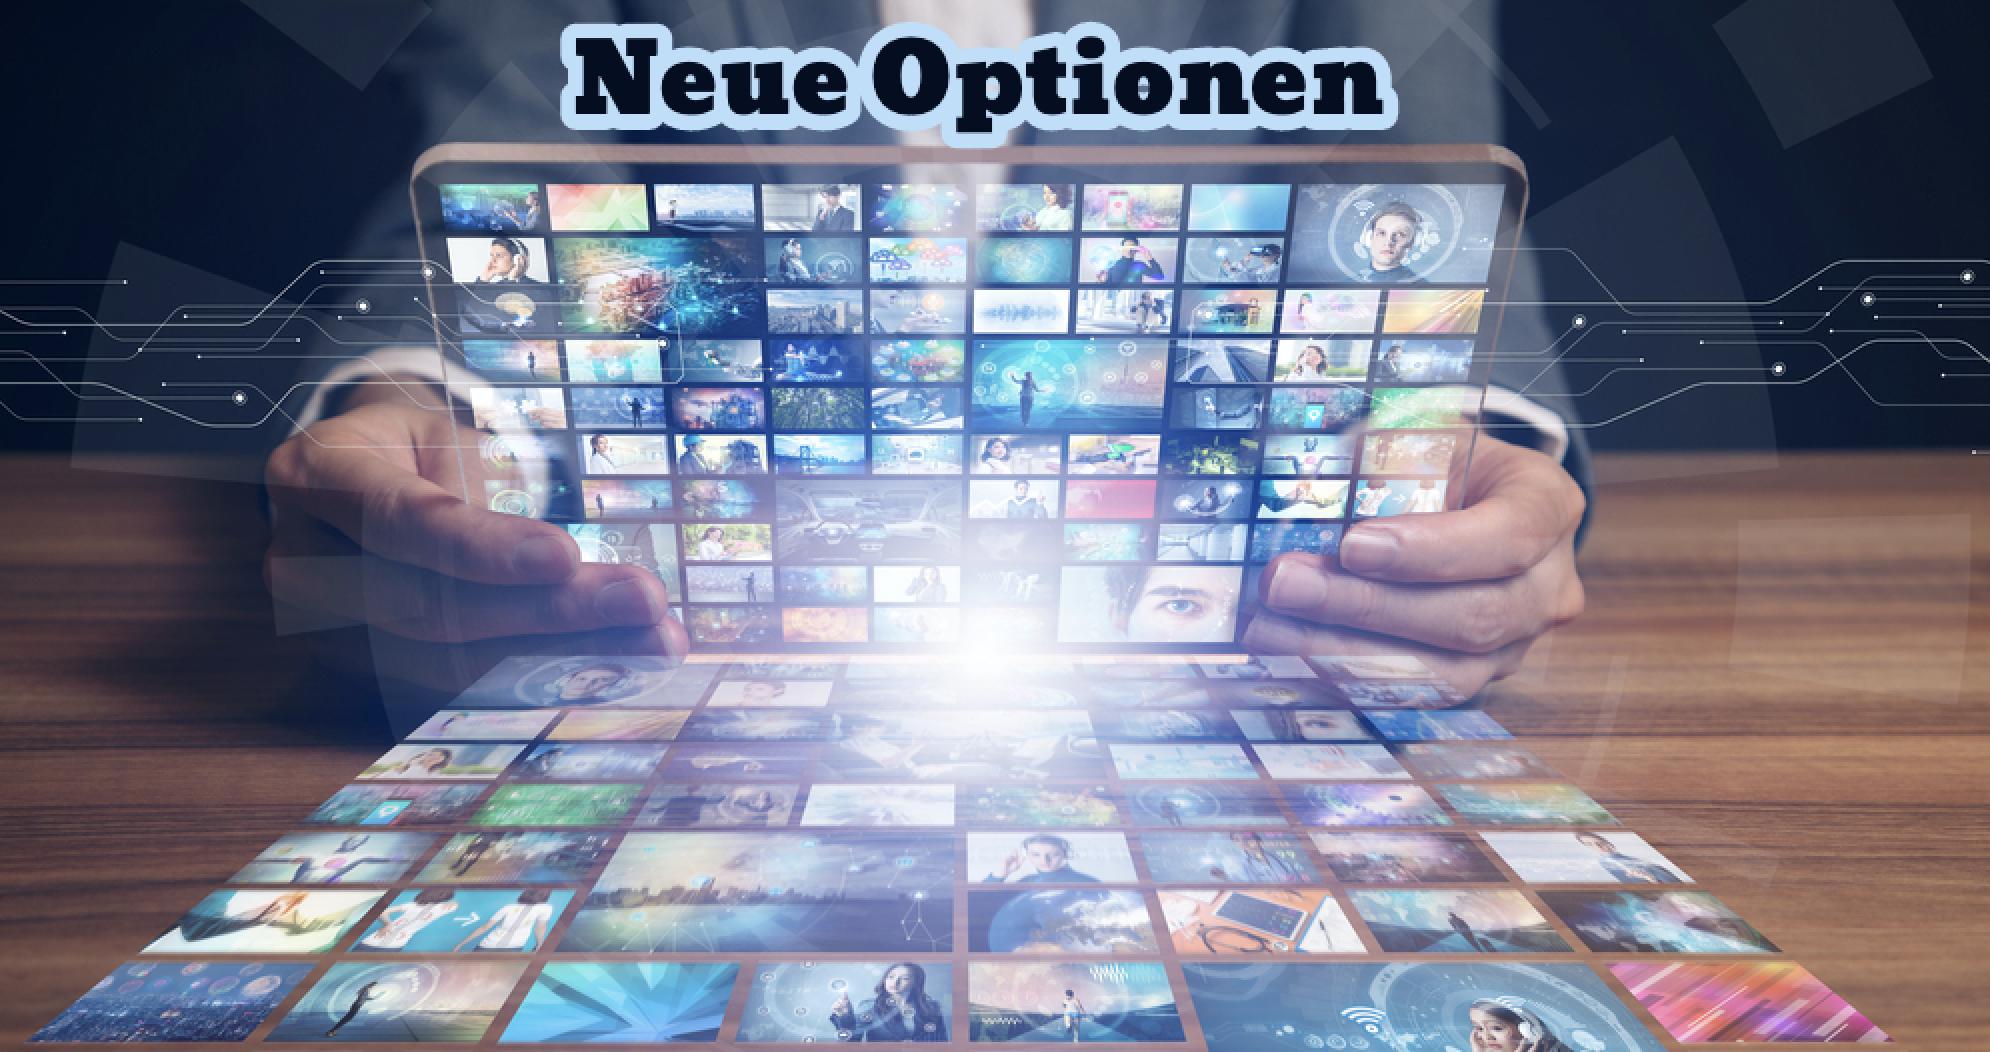 NEU! Erweiterte Optionen in Kommunikationskanälen